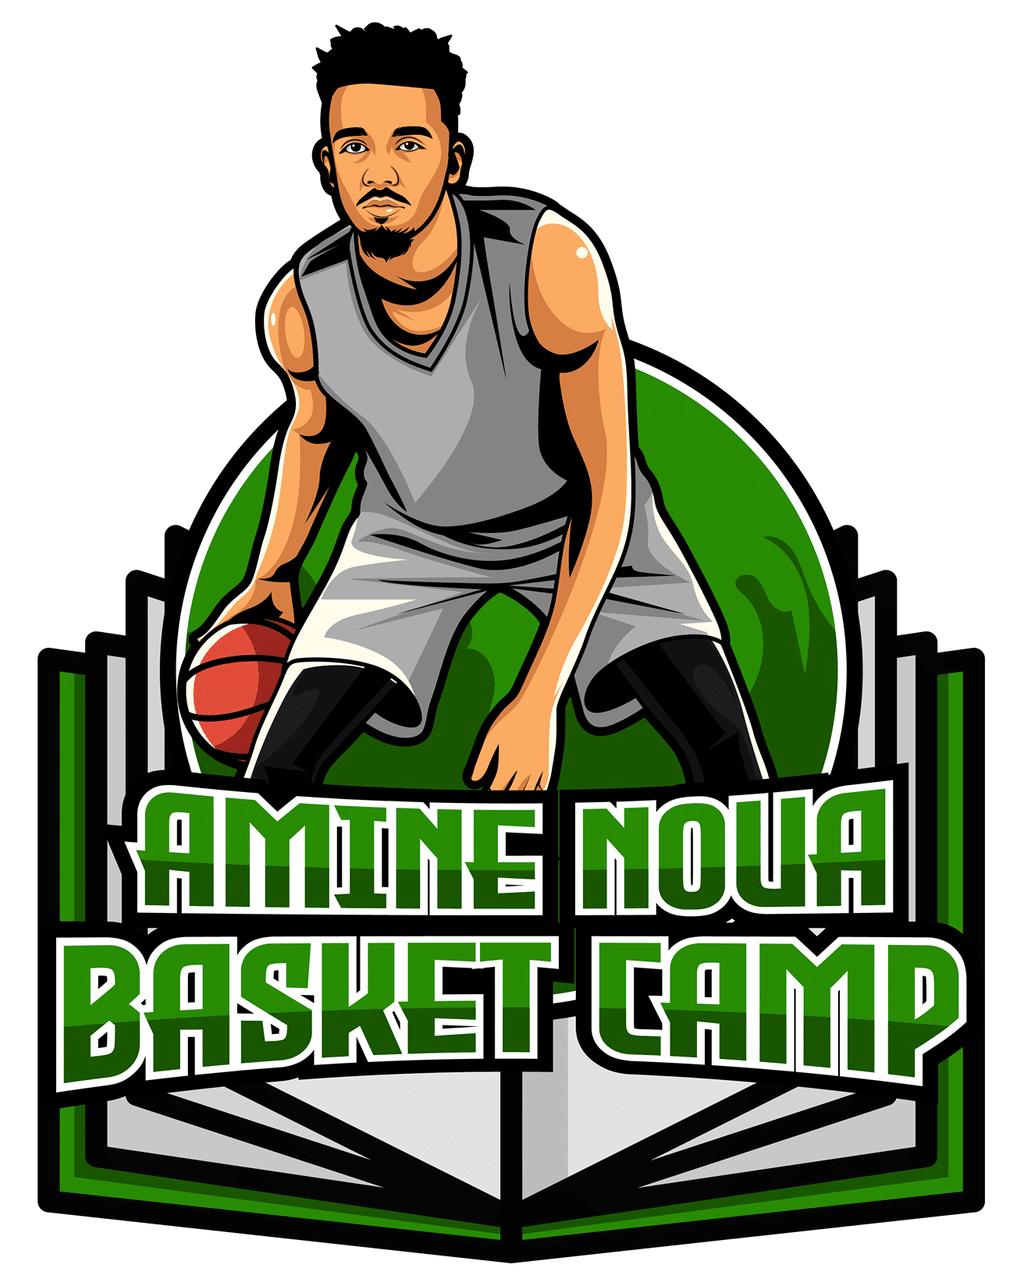 Amine Noua Basket Camp